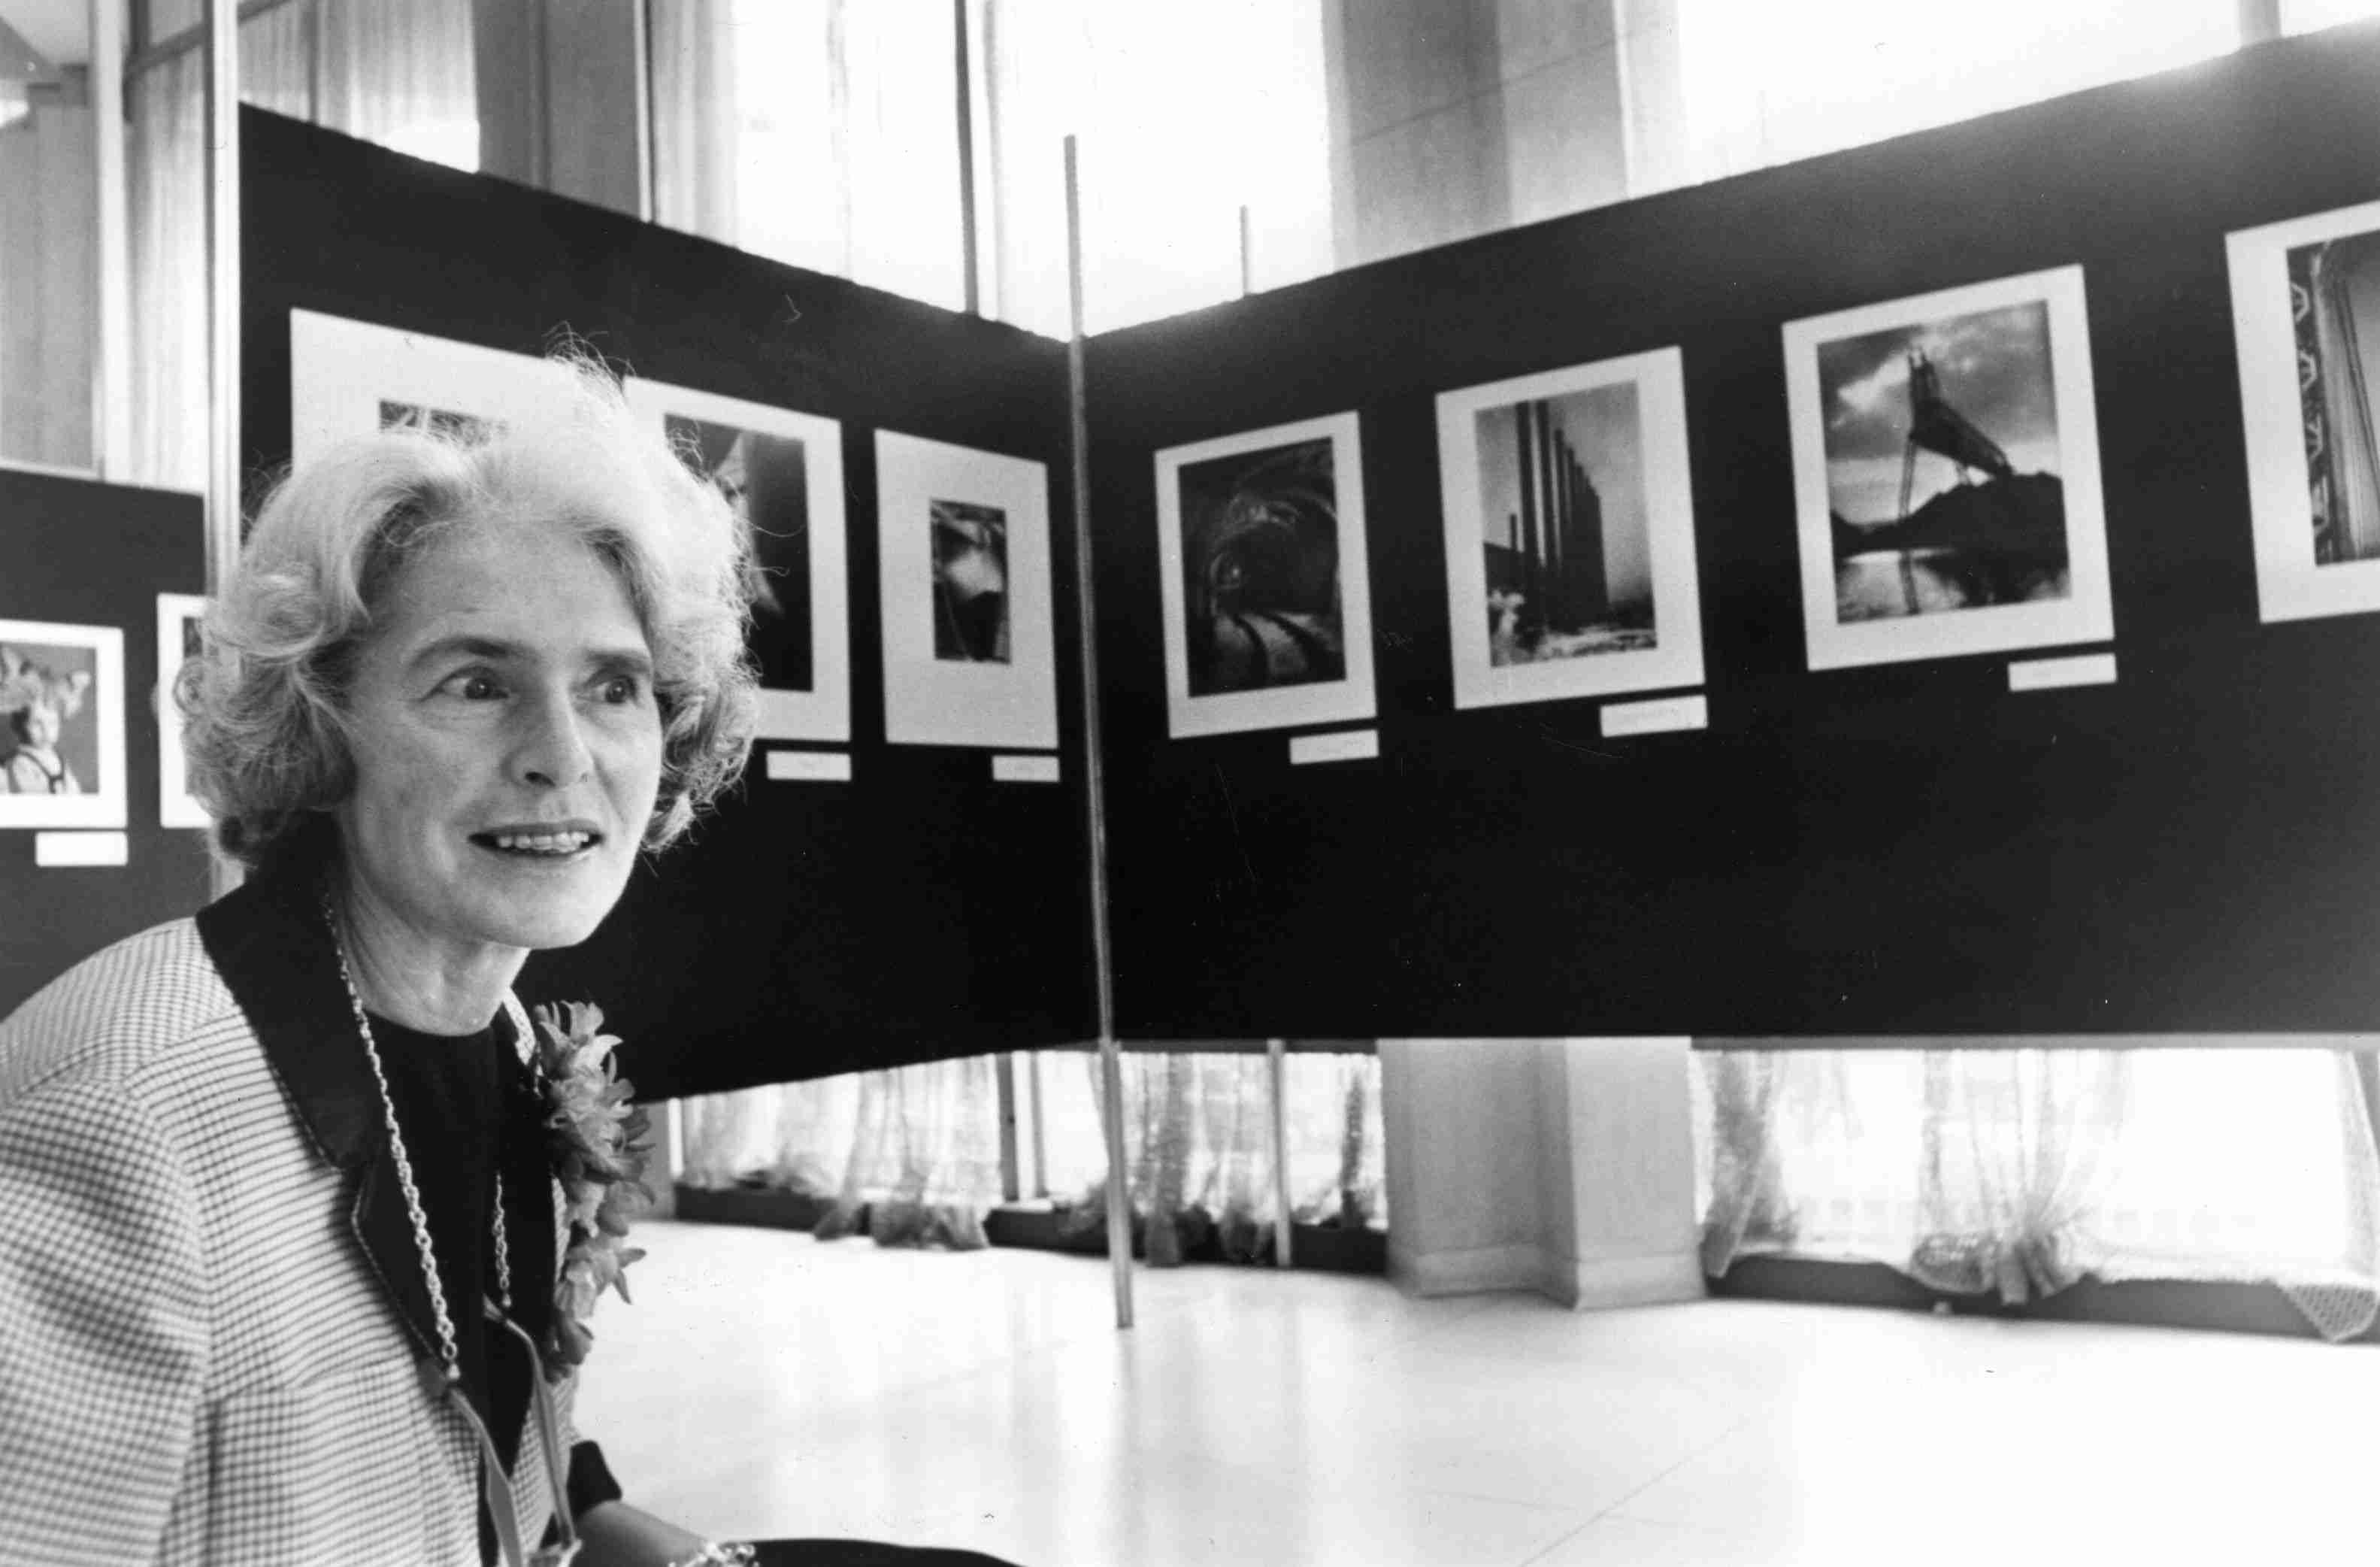 US photojournalist Margaret Bourke-White at an exhibition